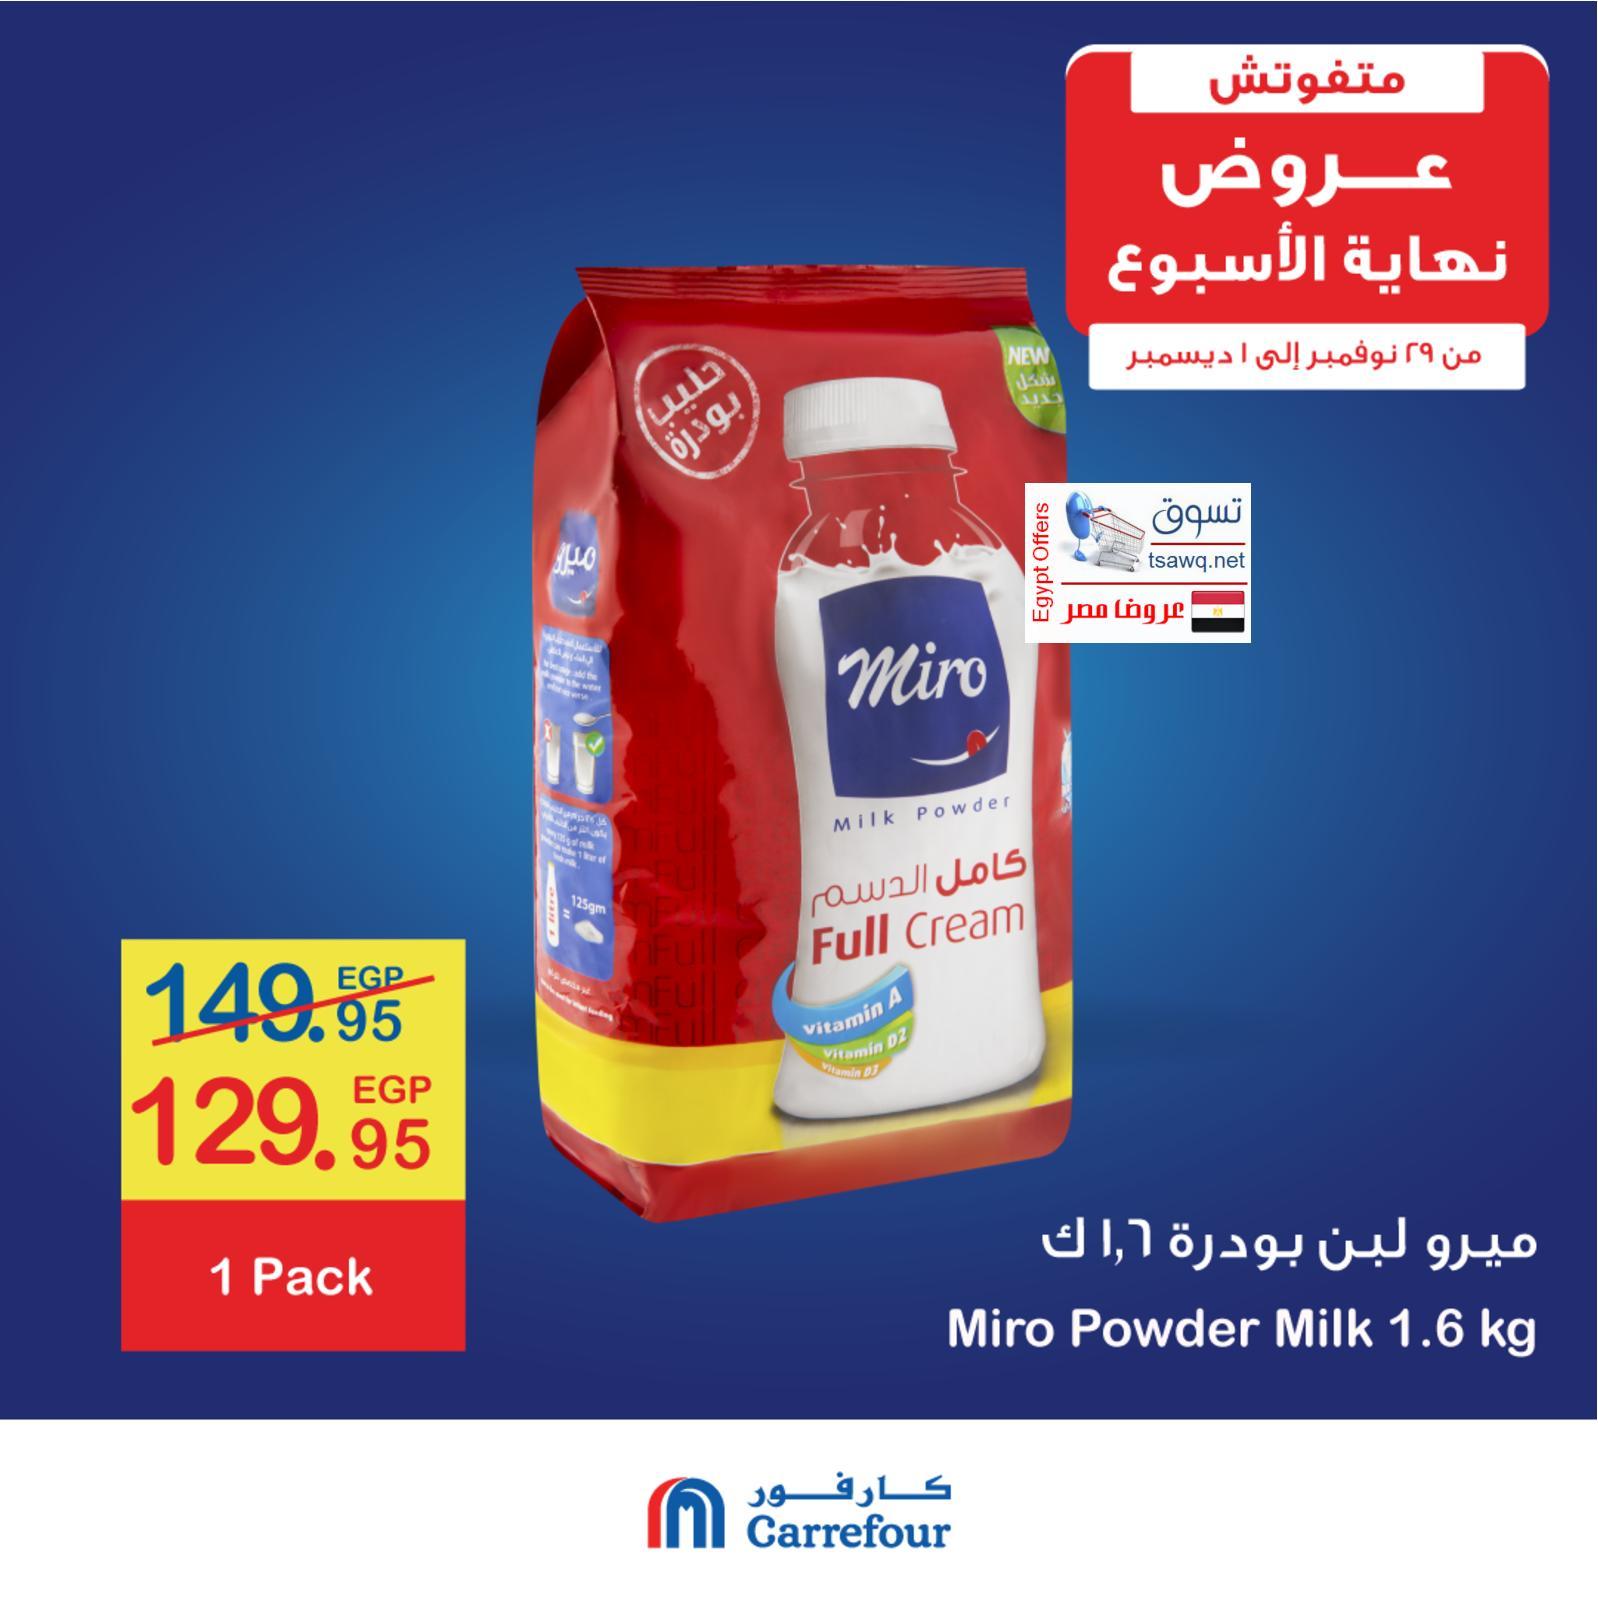 Calameo Tsawq Net Carrefour Egypt 29 11 2018